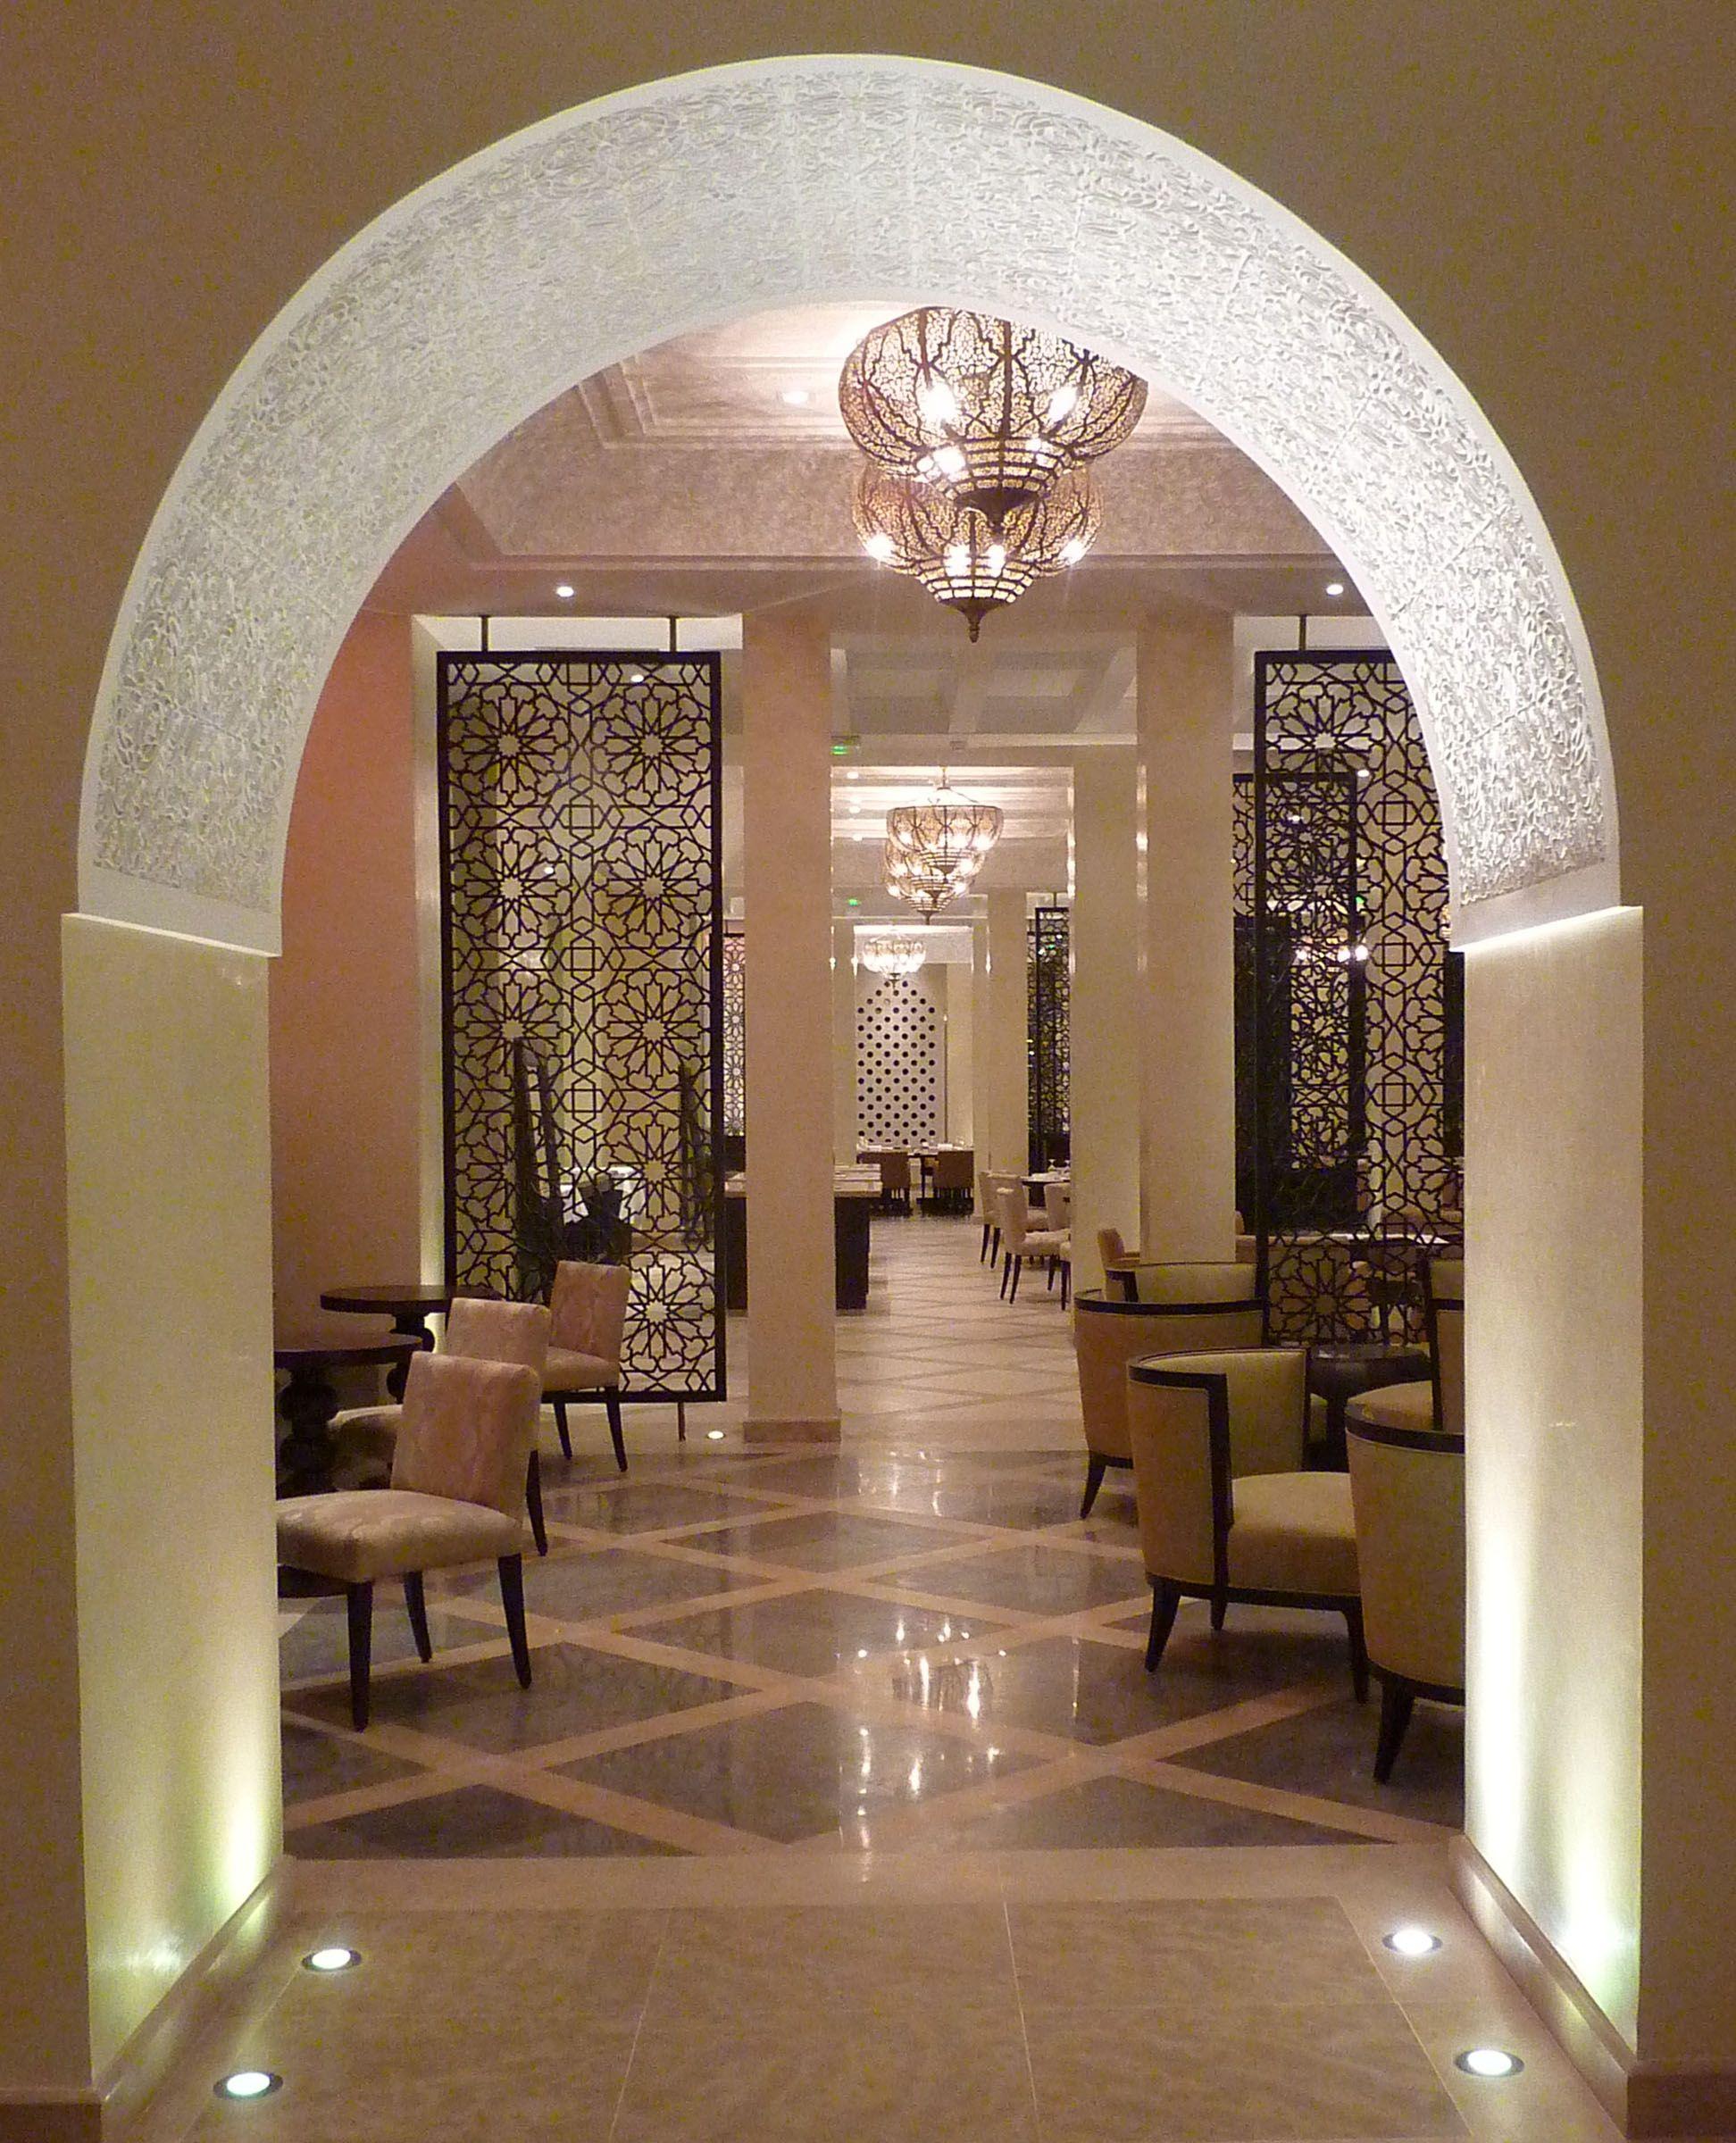 Four Seasons Marrakech Hotel lighting by Lighting Design International. & Four Seasons Marrakech Hotel lighting by Lighting Design ...